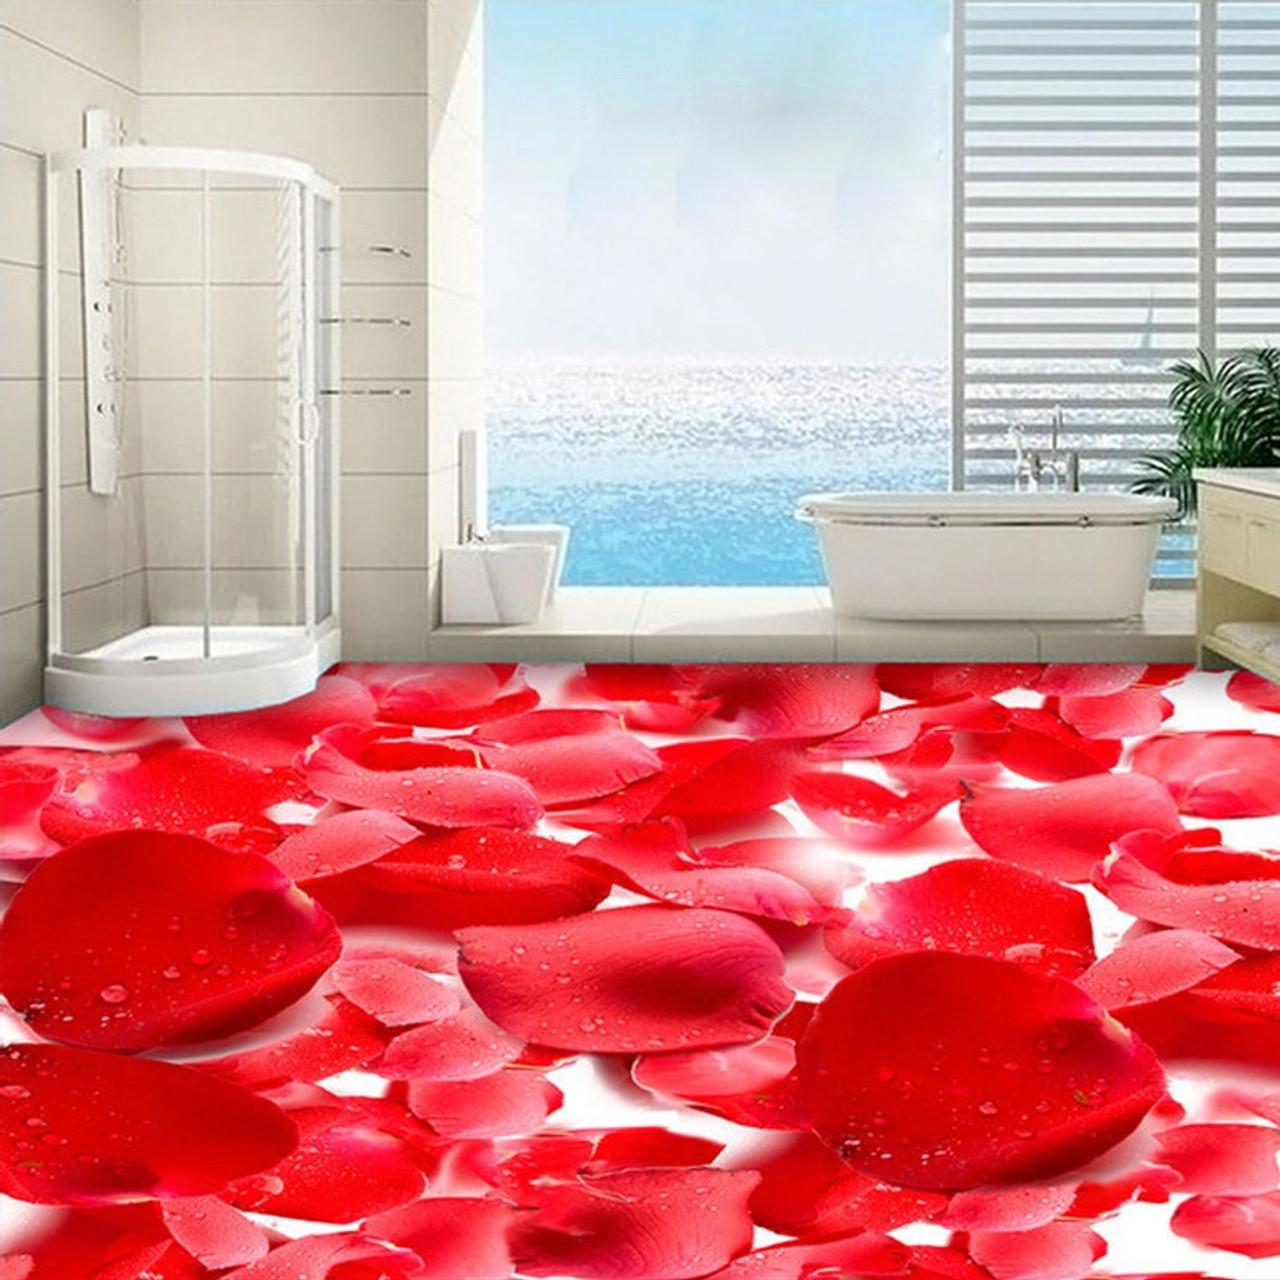 3d Red Flowers Photo Floor Wallpaper Stickers Anti Wear Living Room Bedroom Waterproof Pvc Self Adhesive Vinyl Flooring Murals Onshopdeals Com